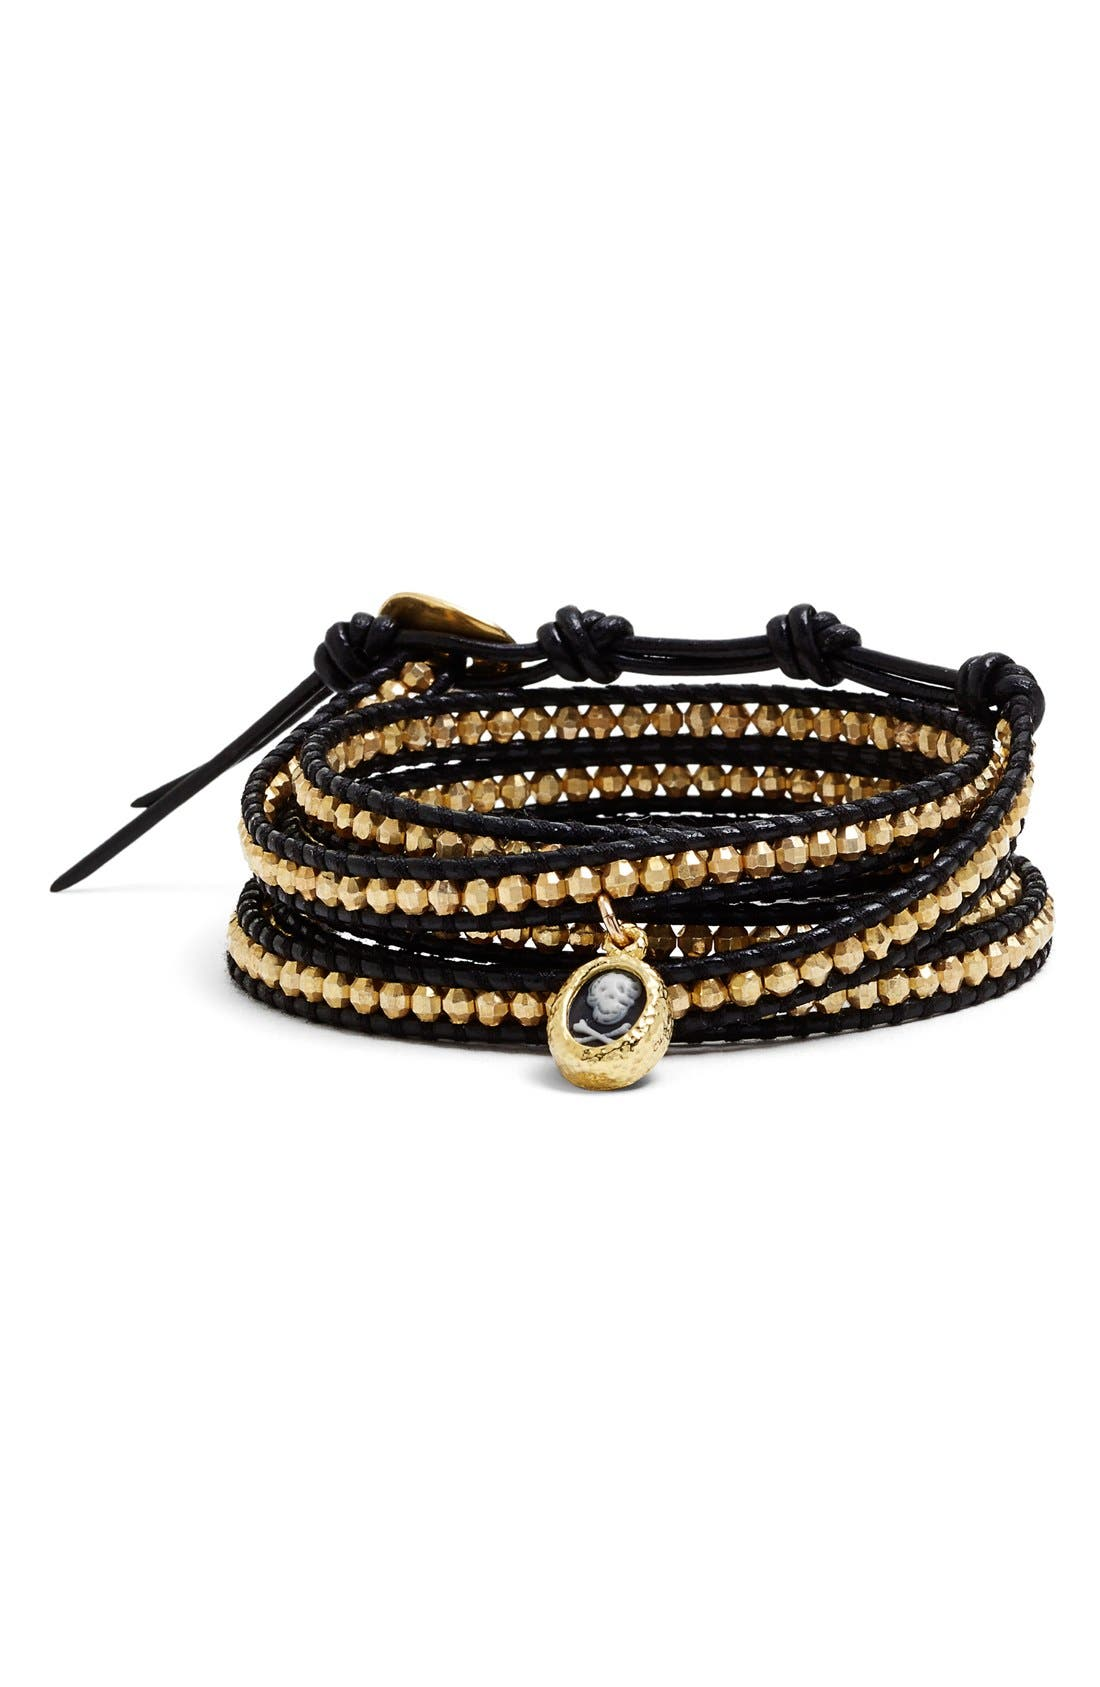 Main Image - Chan Luu Skull Charm Beaded Leather Wrap Bracelet